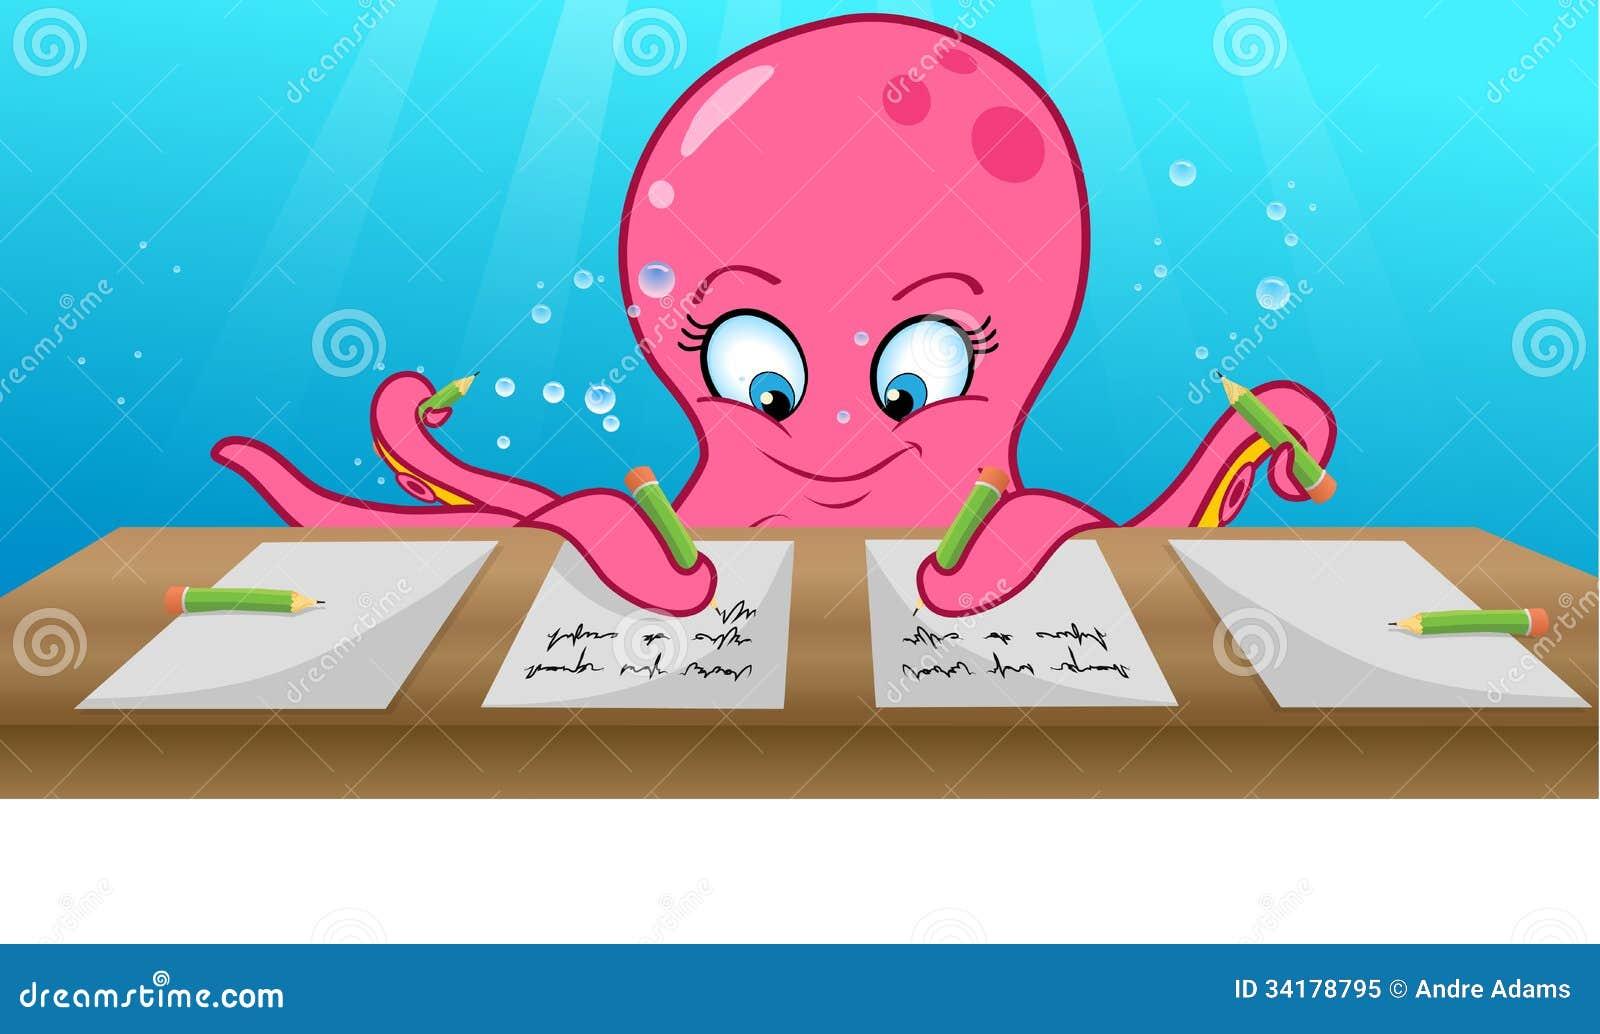 Octopus Writing Royalty Free Stock Photo Image 34178795